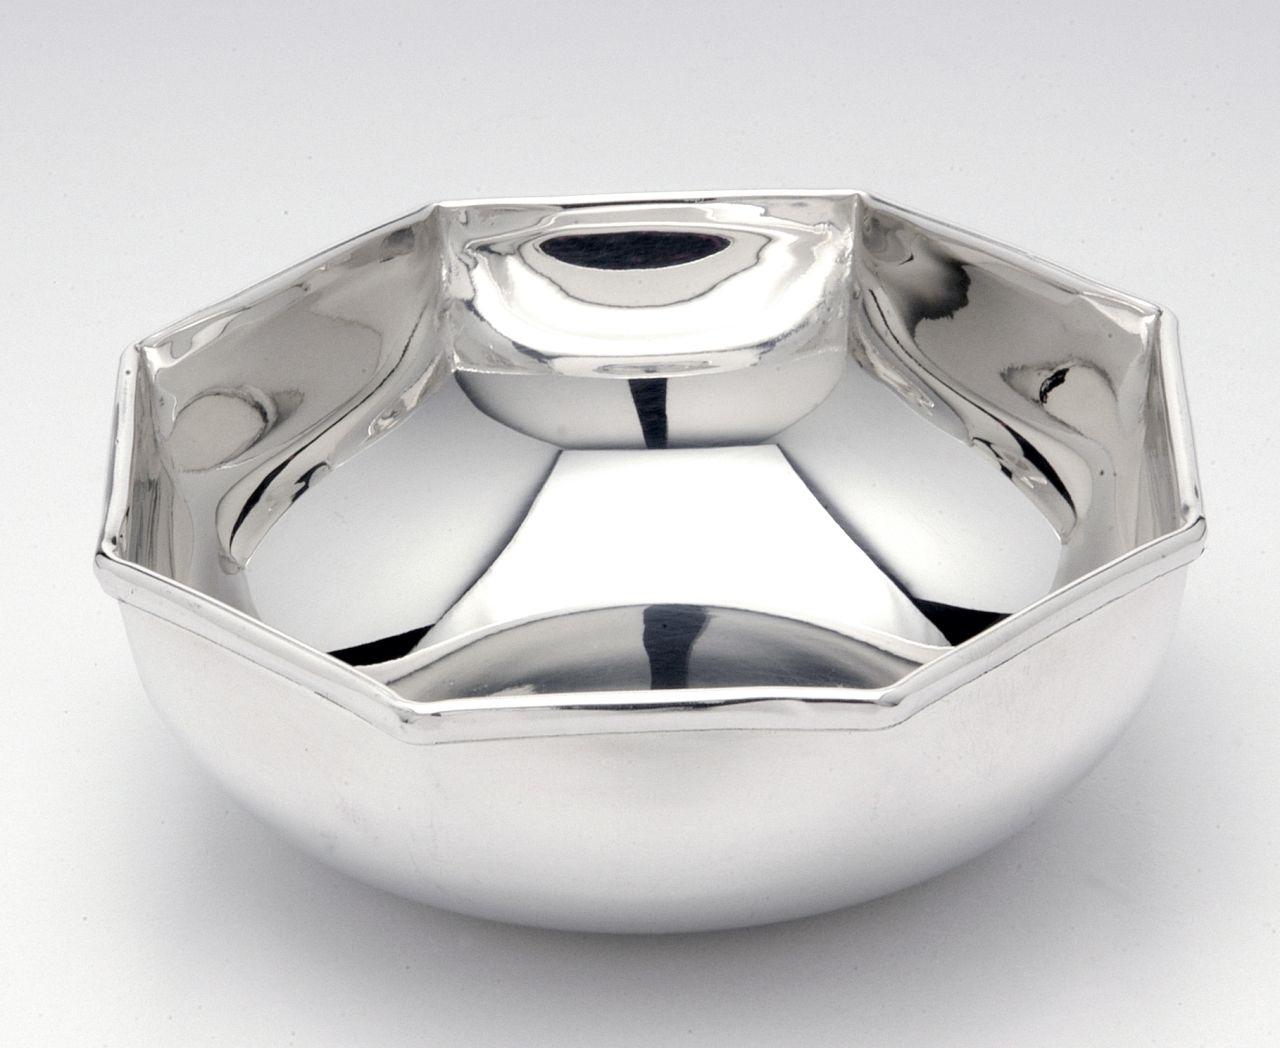 Ciotola placcata argento stile Ottagonale cm.4,5h diam.14